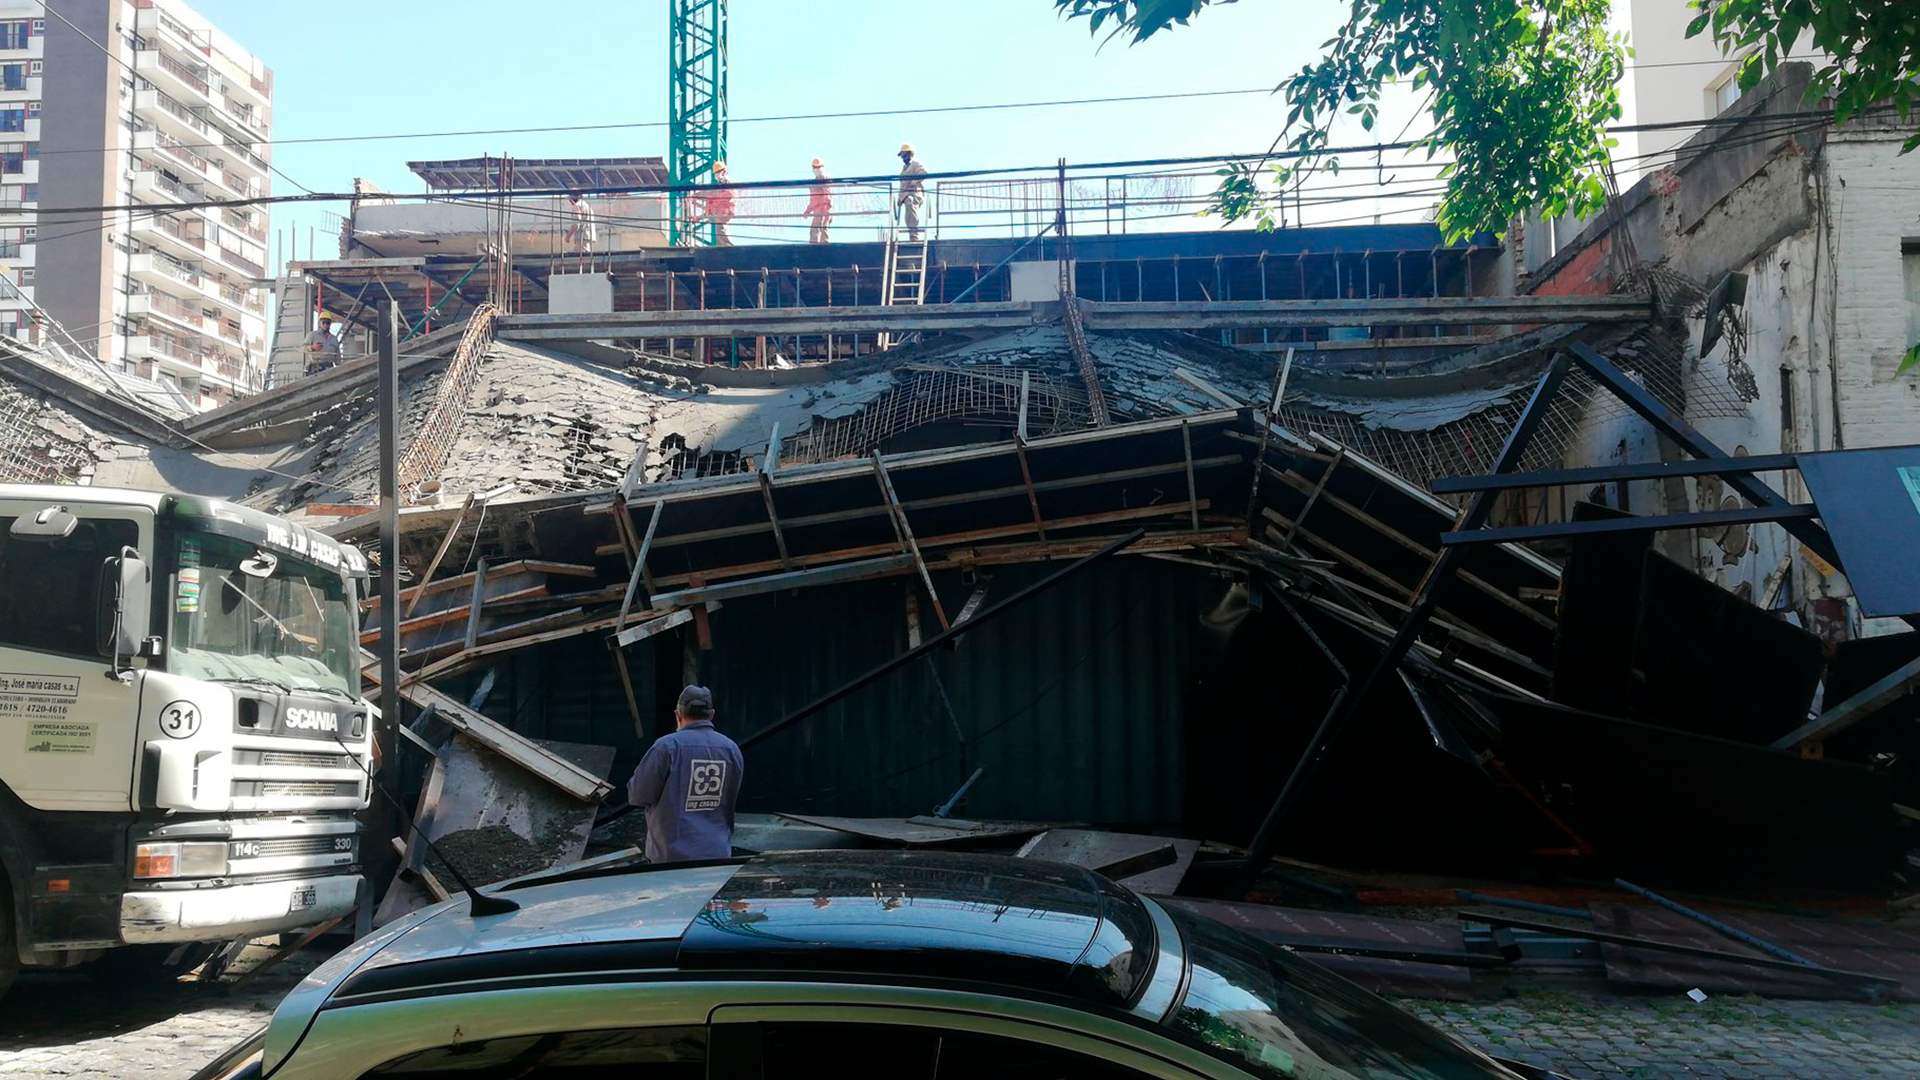 Derrumbe de obra en Belgrano